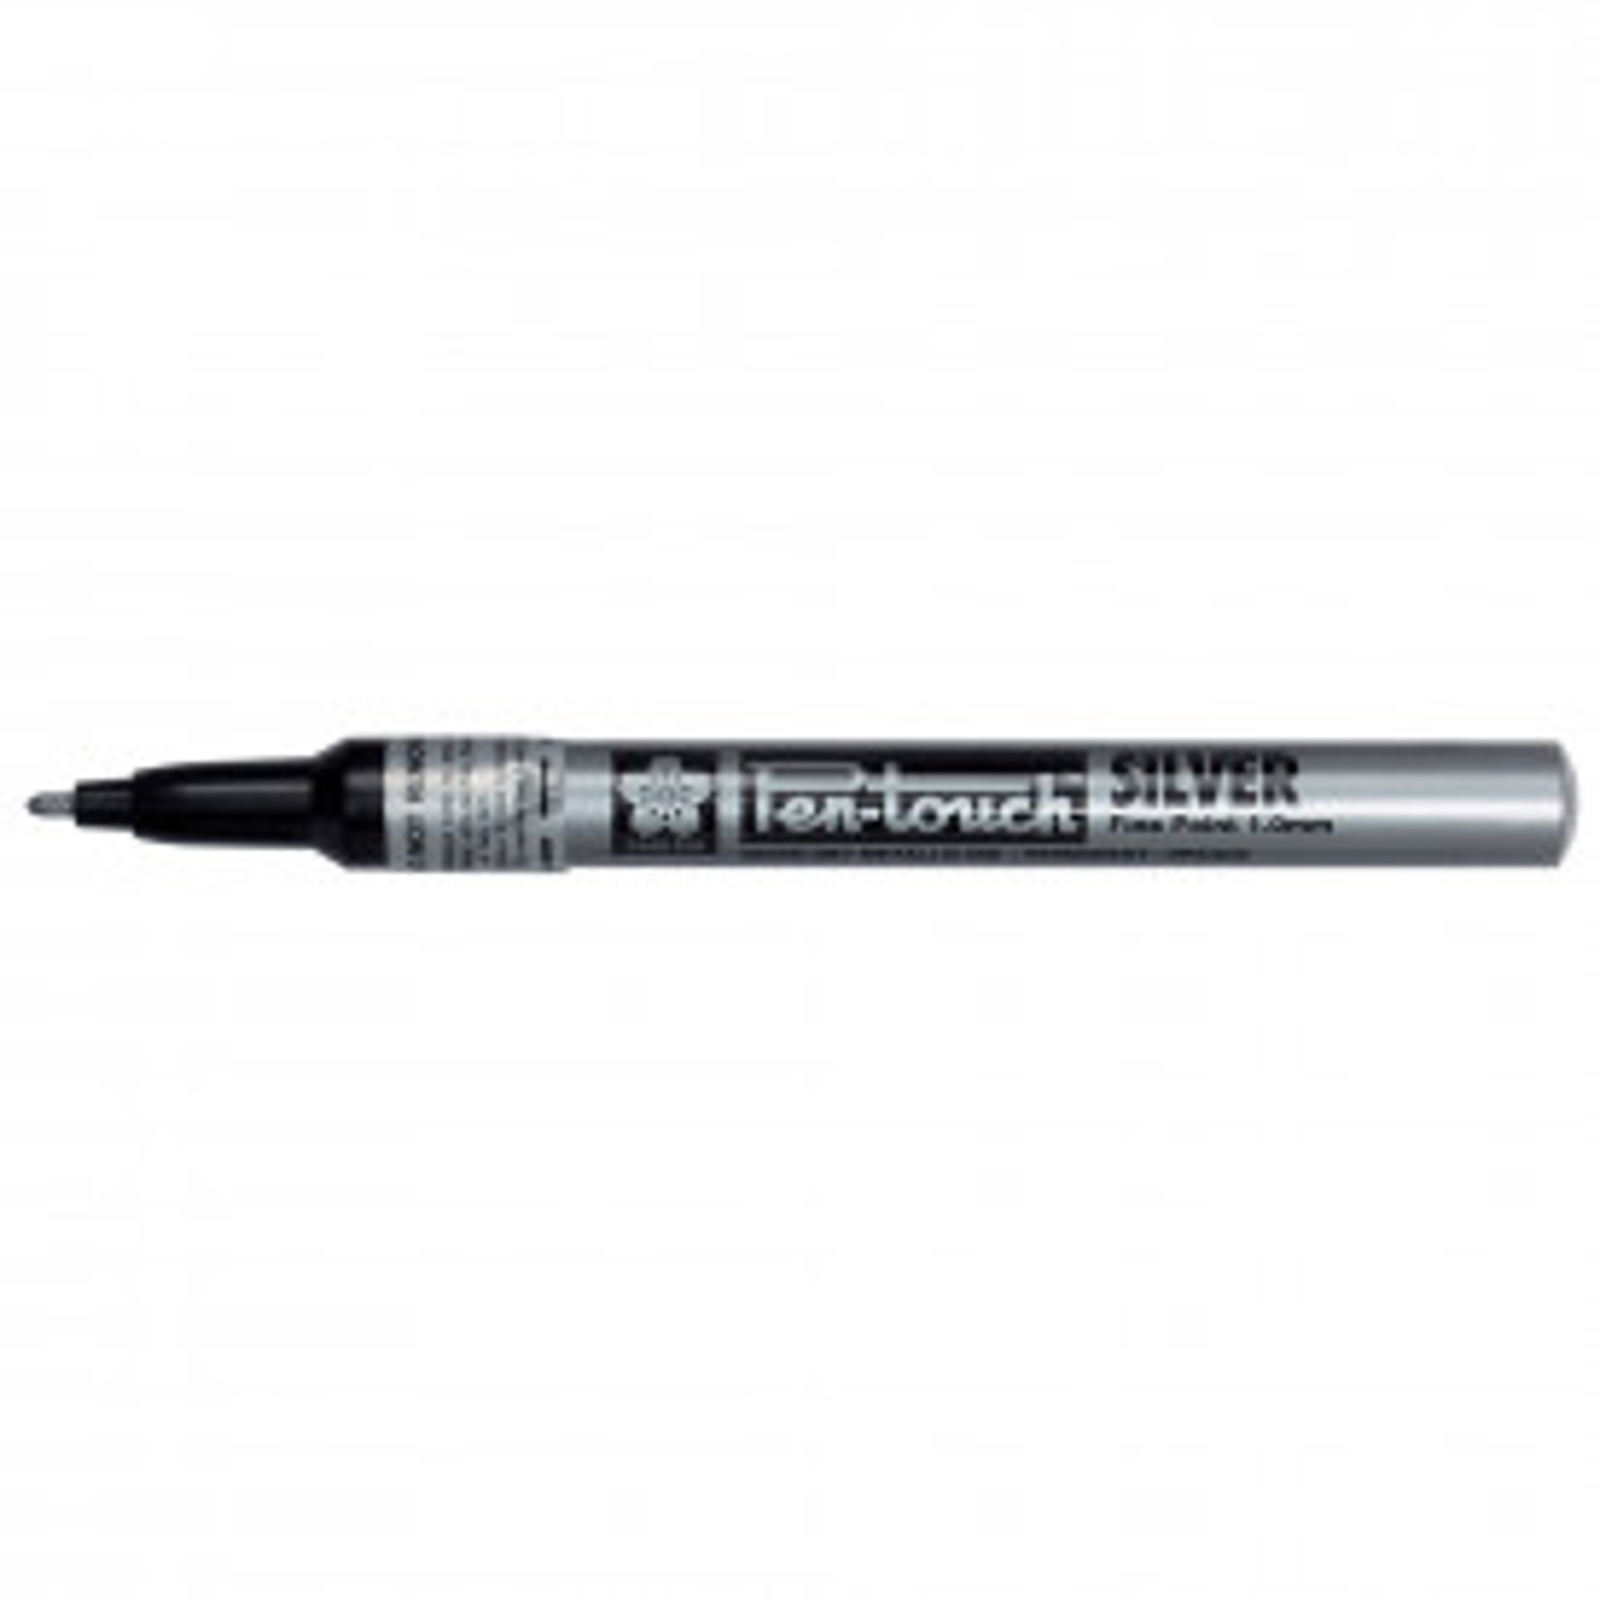 Pentouch Metallic Pens